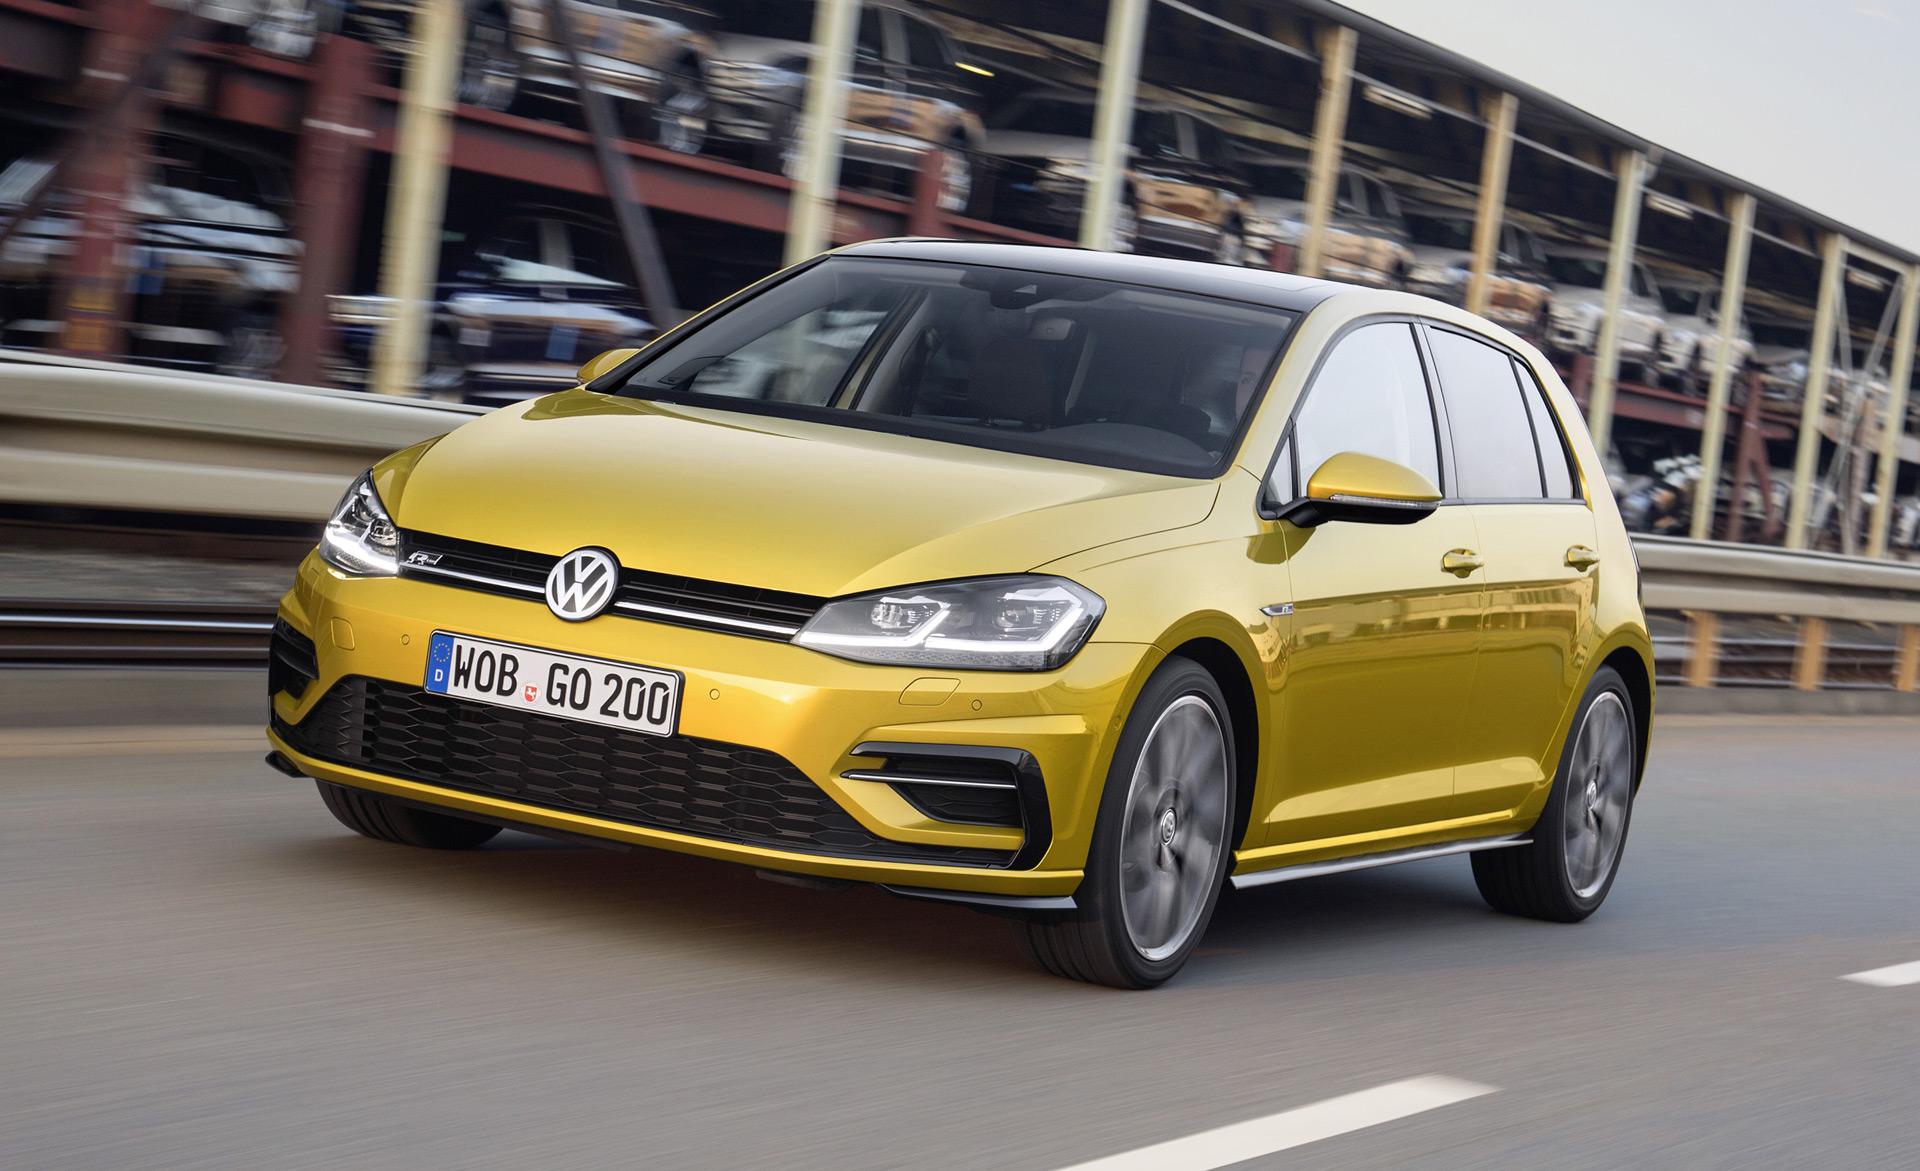 2018 Volkswagen Golf price